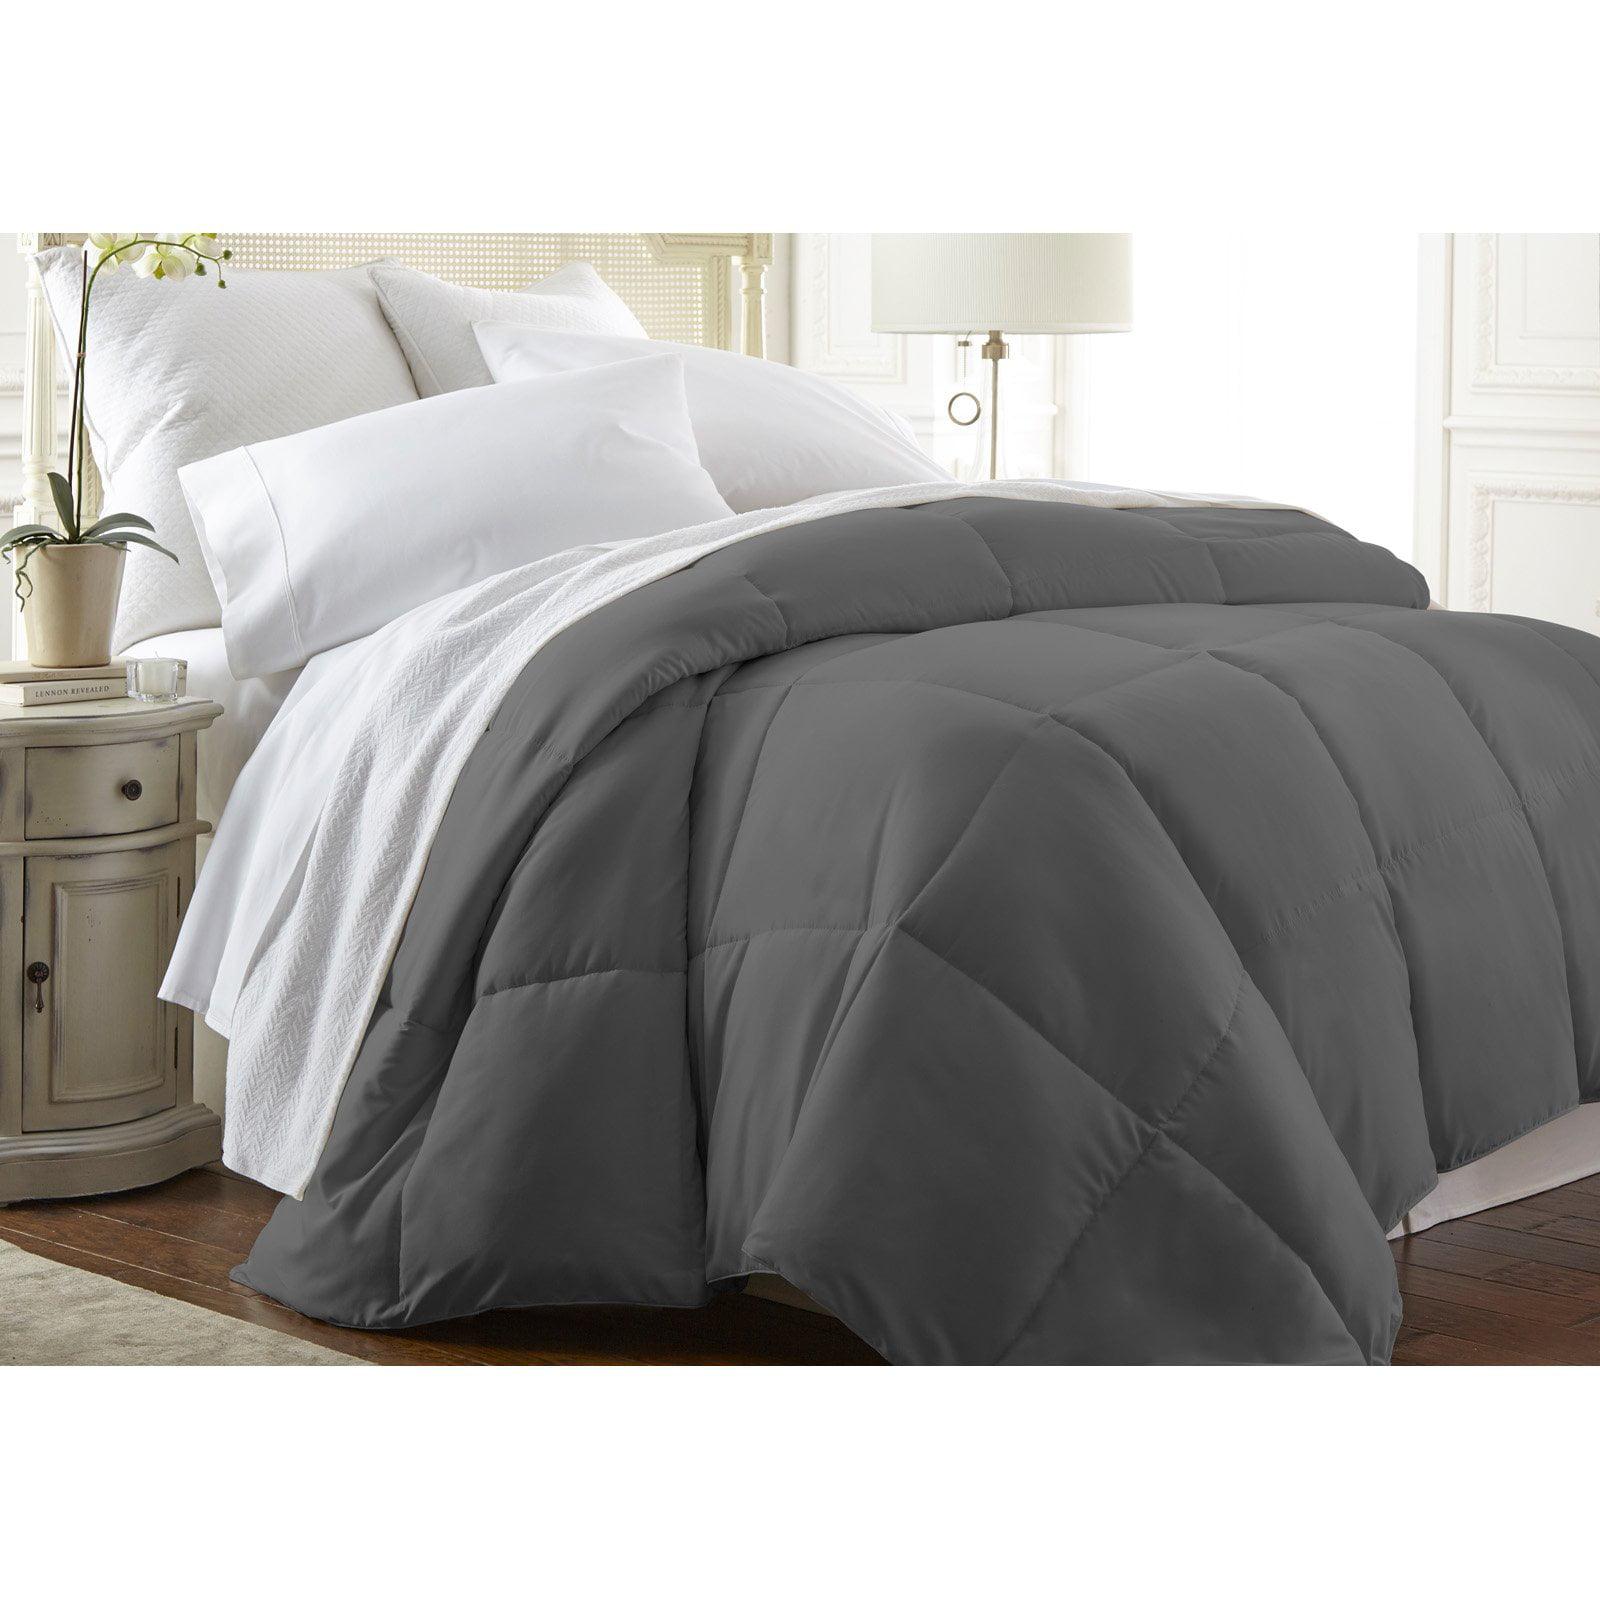 Simply Soft All Season Down Alternative Comforter by ienjoy Home